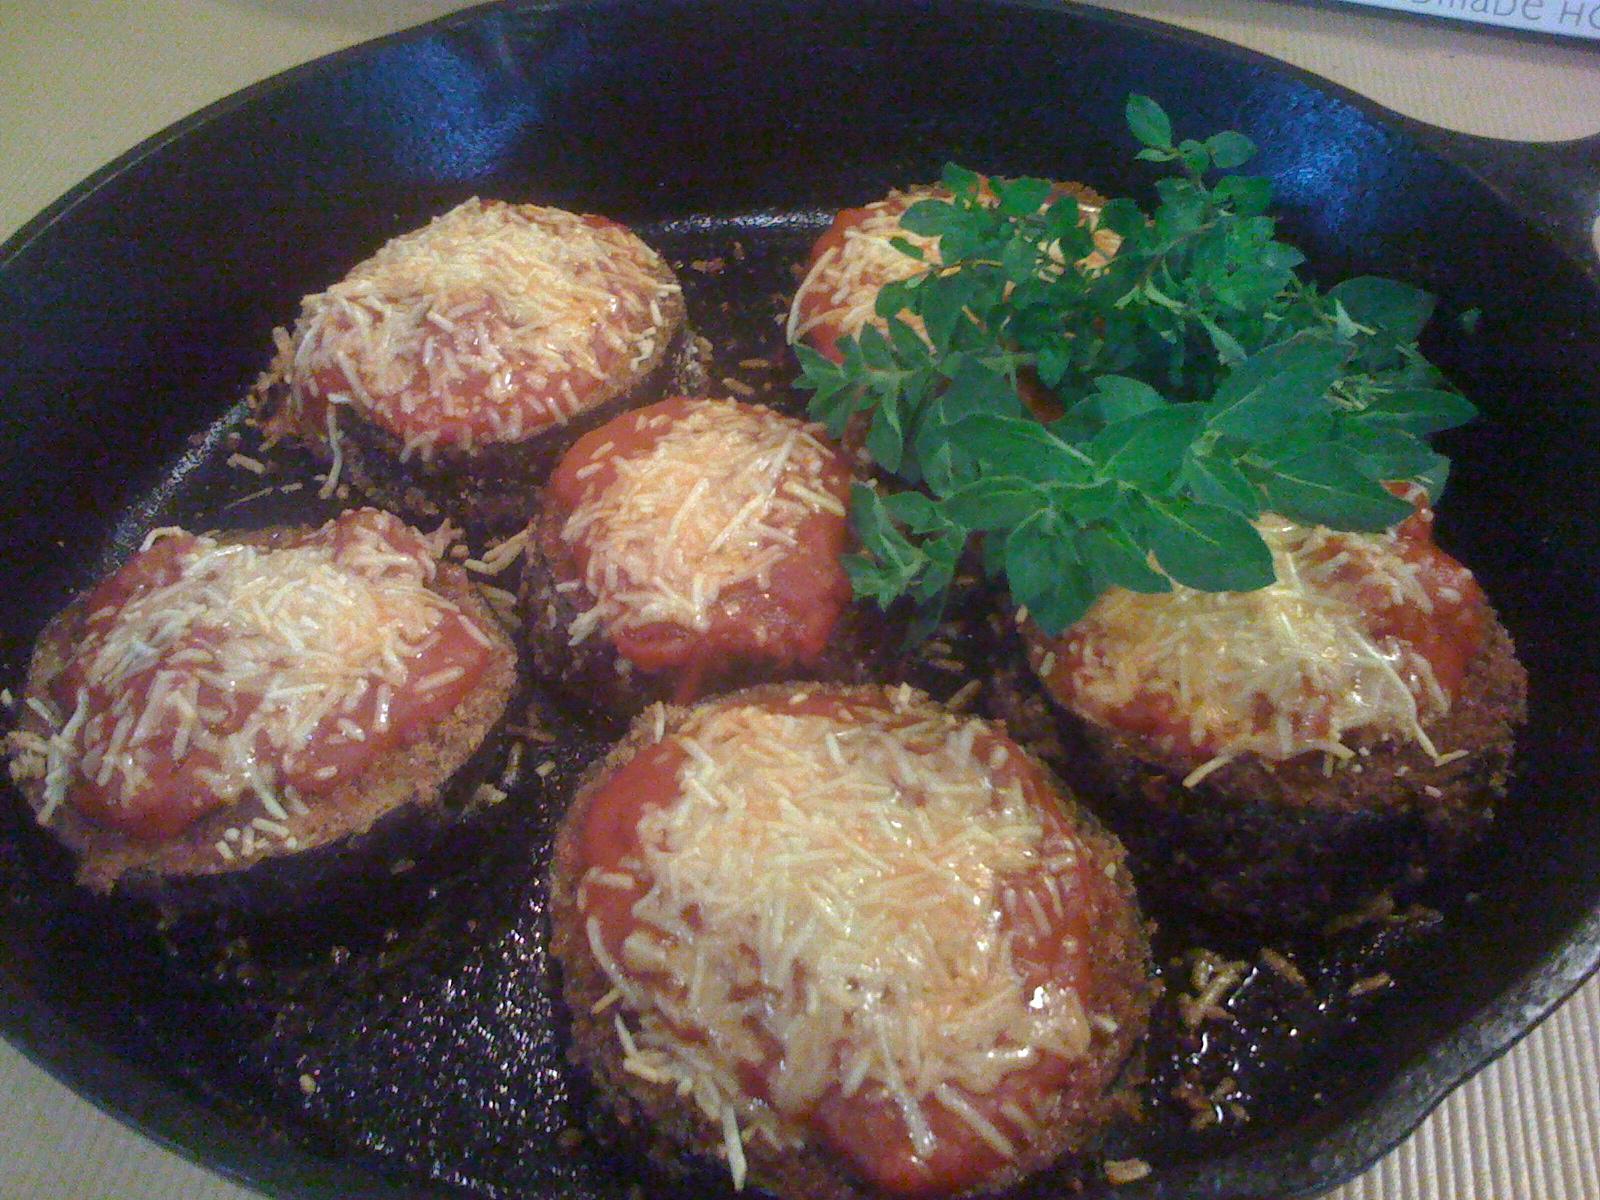 ... Cast Iron - Cast Iron Recipes: Recipe: Eggplant Parmesan (Gluten Free